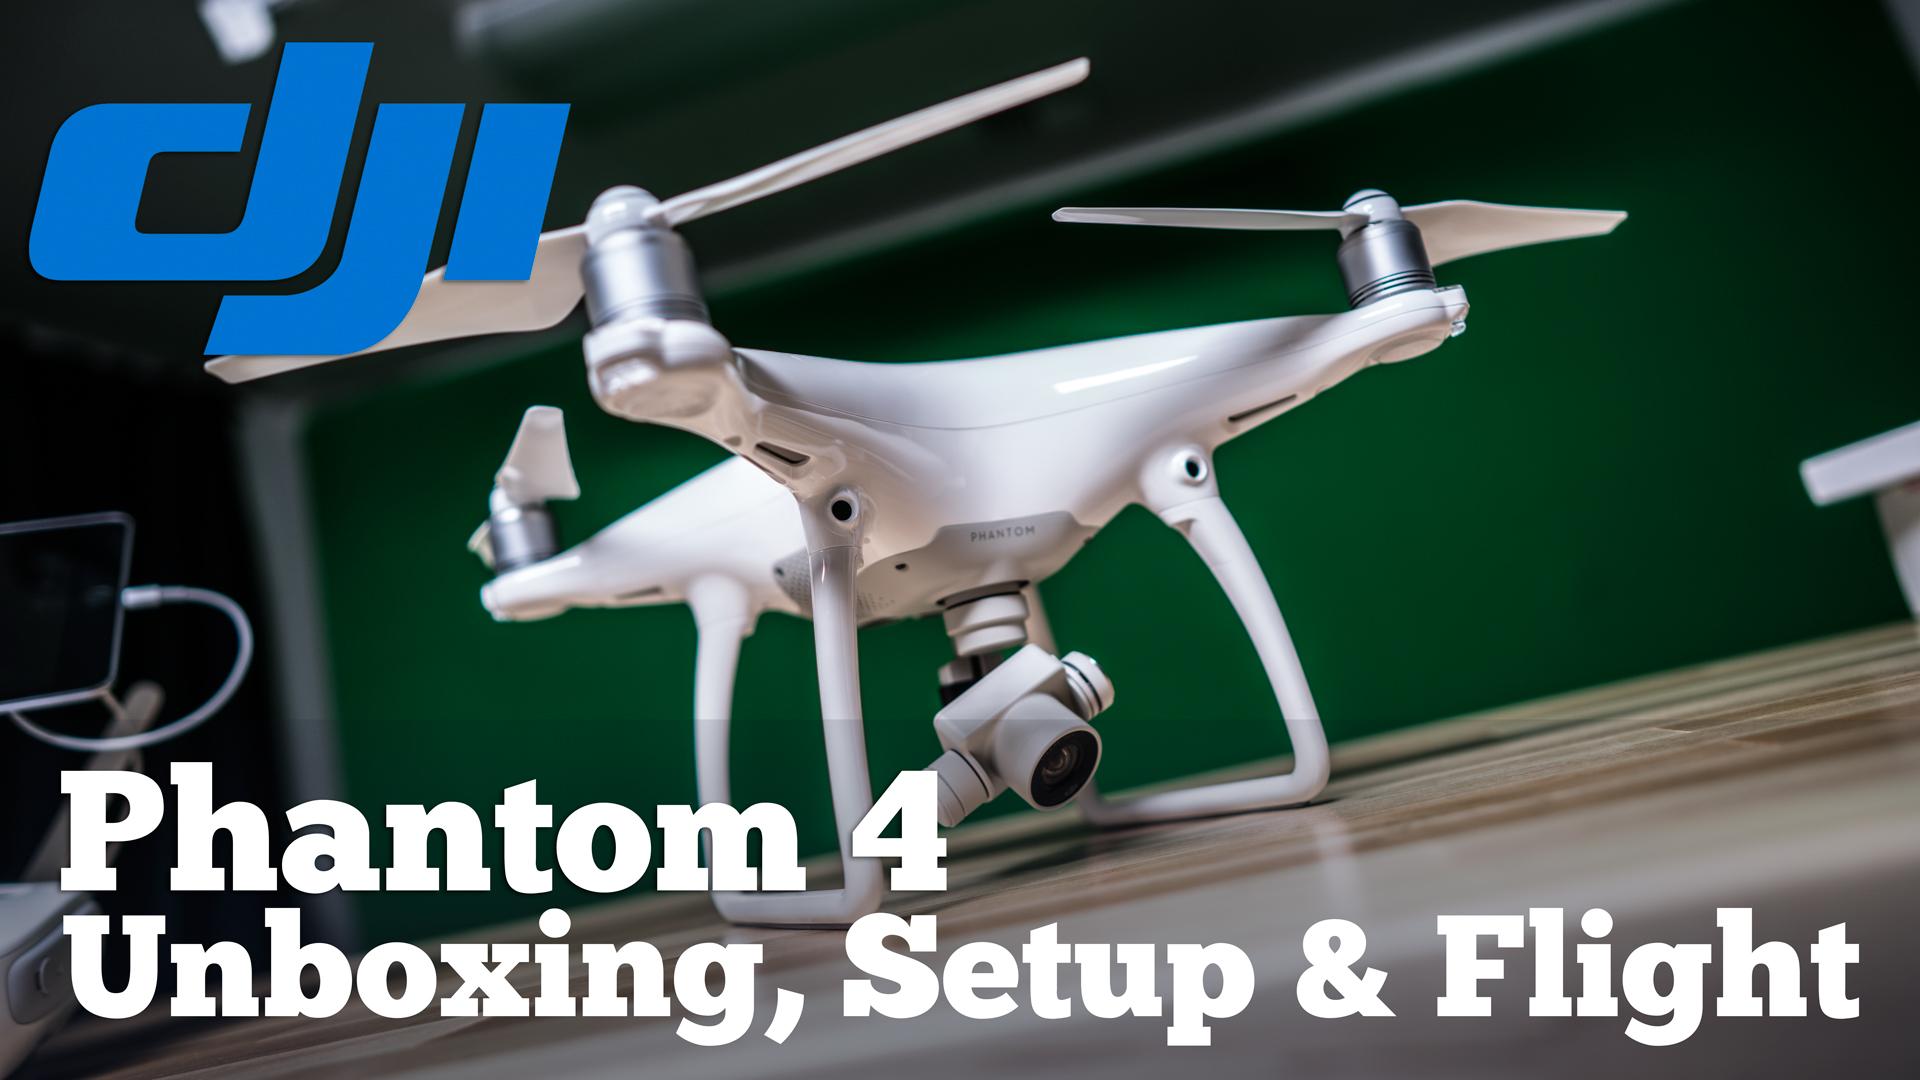 DJI Phanton 4 Unboxing, Setup and First Flight